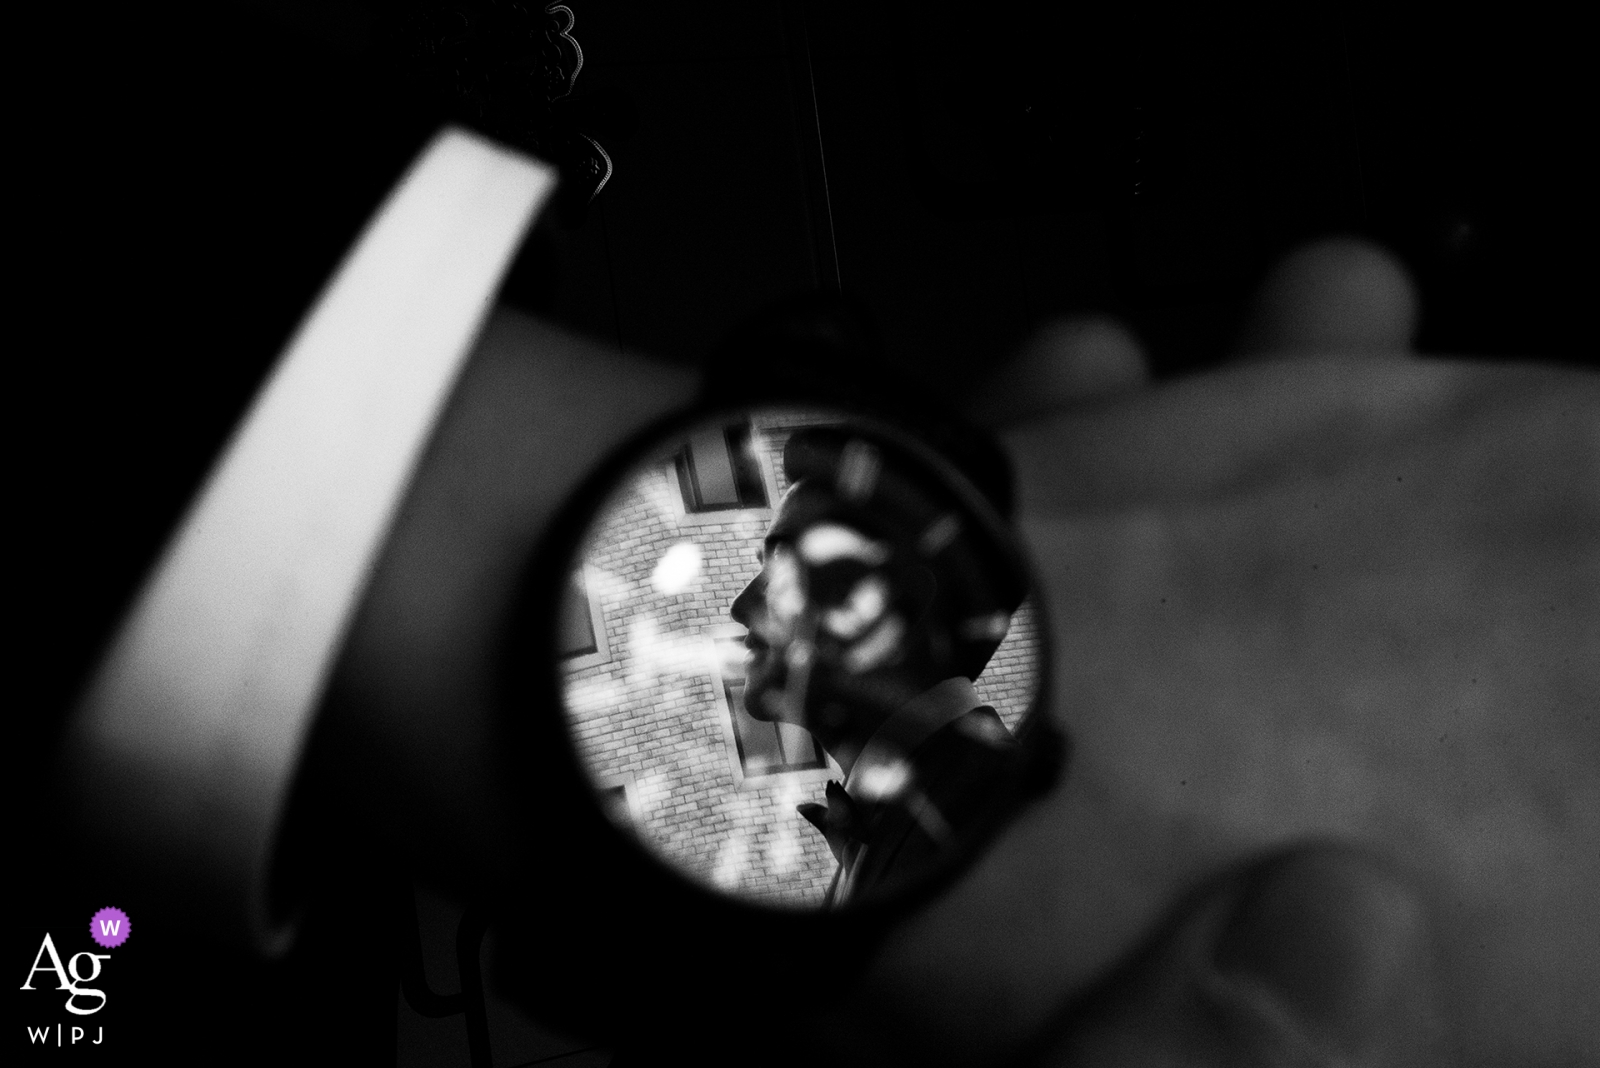 Fuzhou Fujian groom portrait in the face of a watch detail.